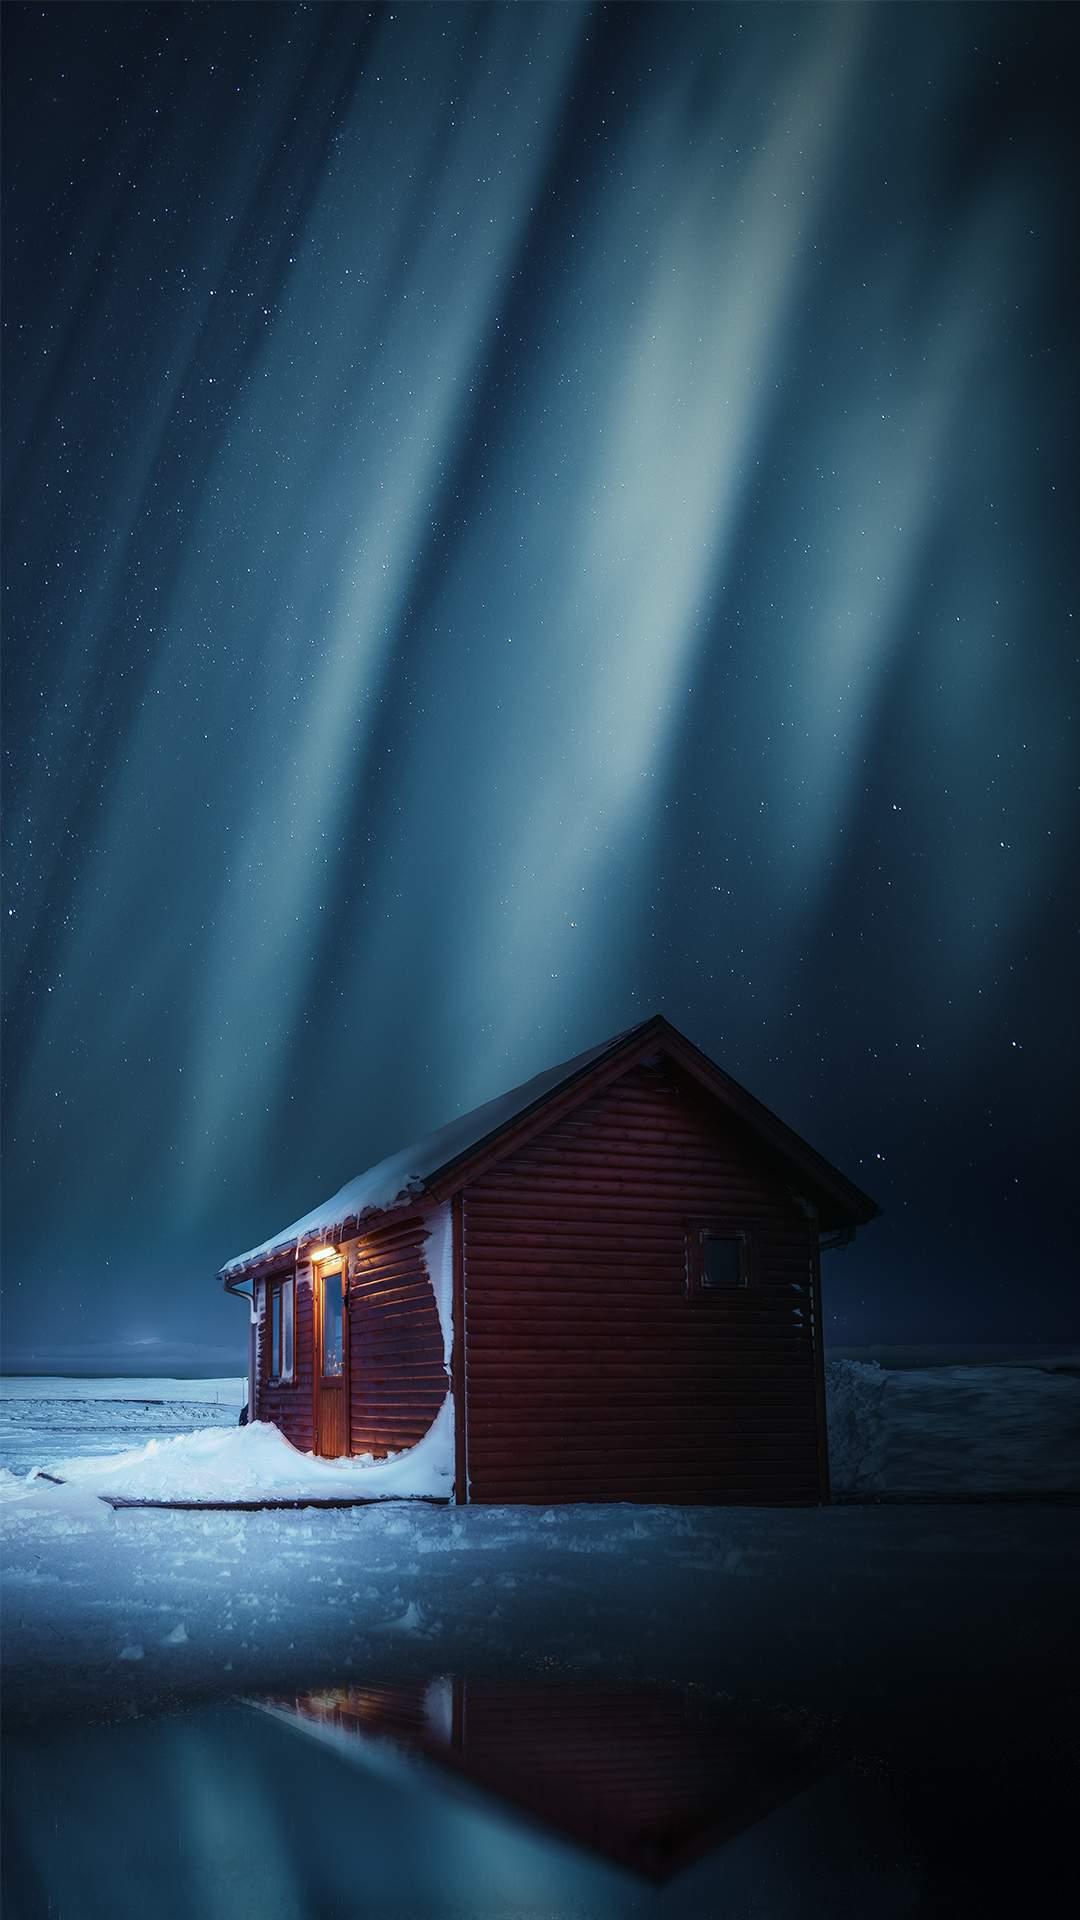 Winter Cabin Nothern Lights iPhone Wallpaper